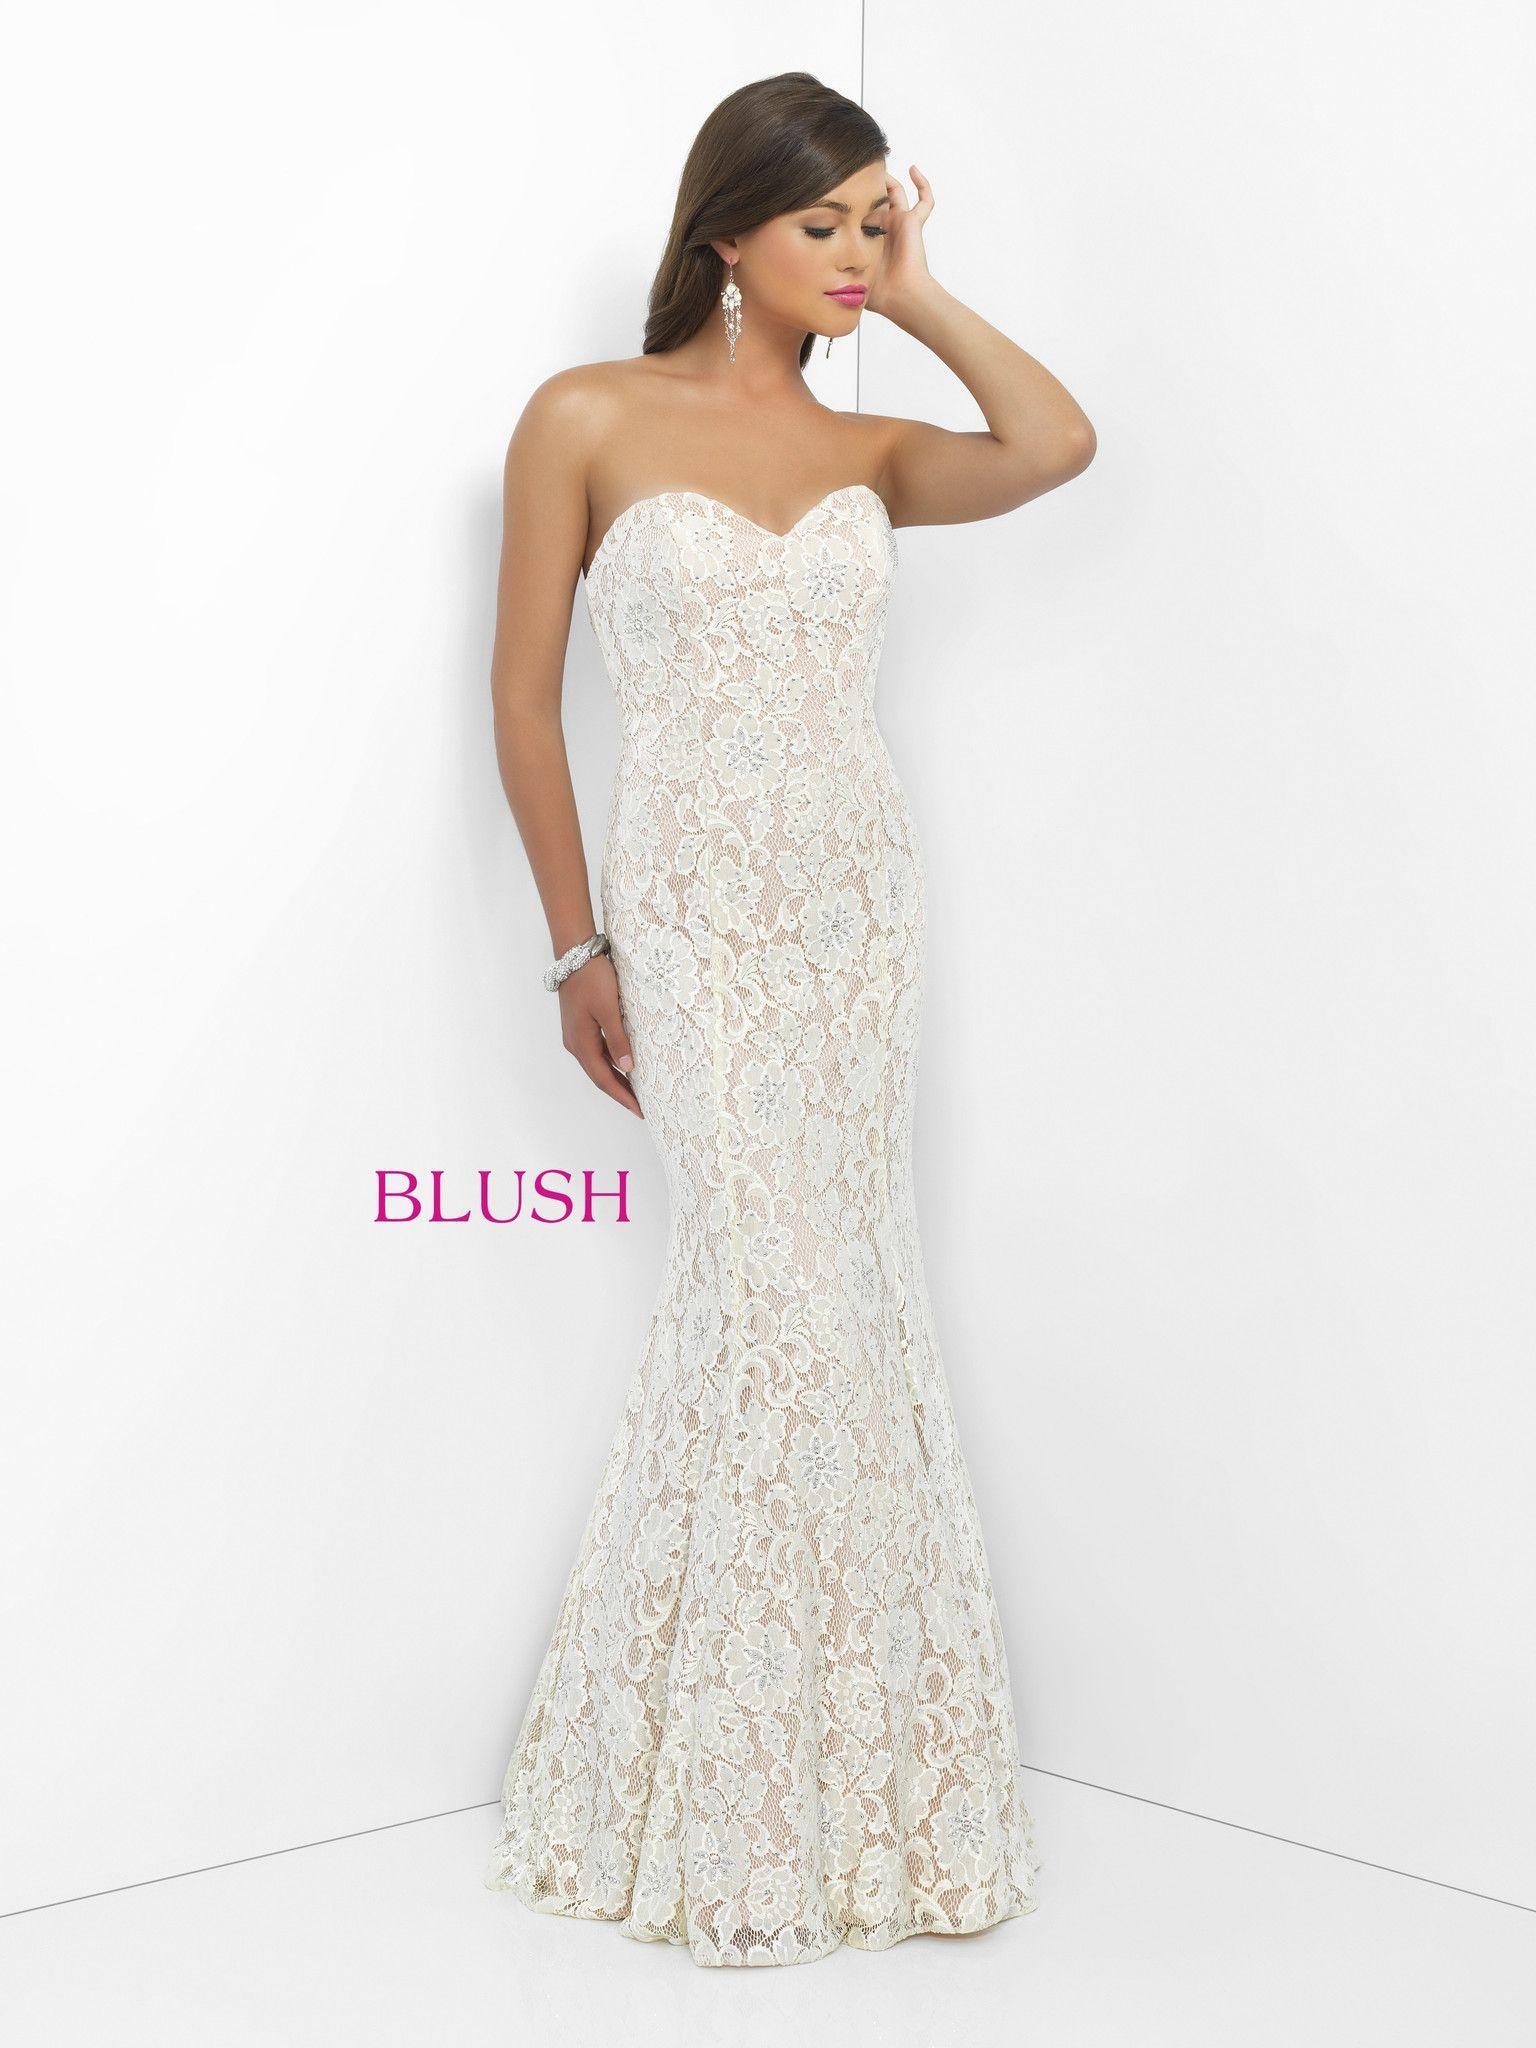 Blush Prom 11110 Cream/Nude | prom dresses | Pinterest | Blush prom ...